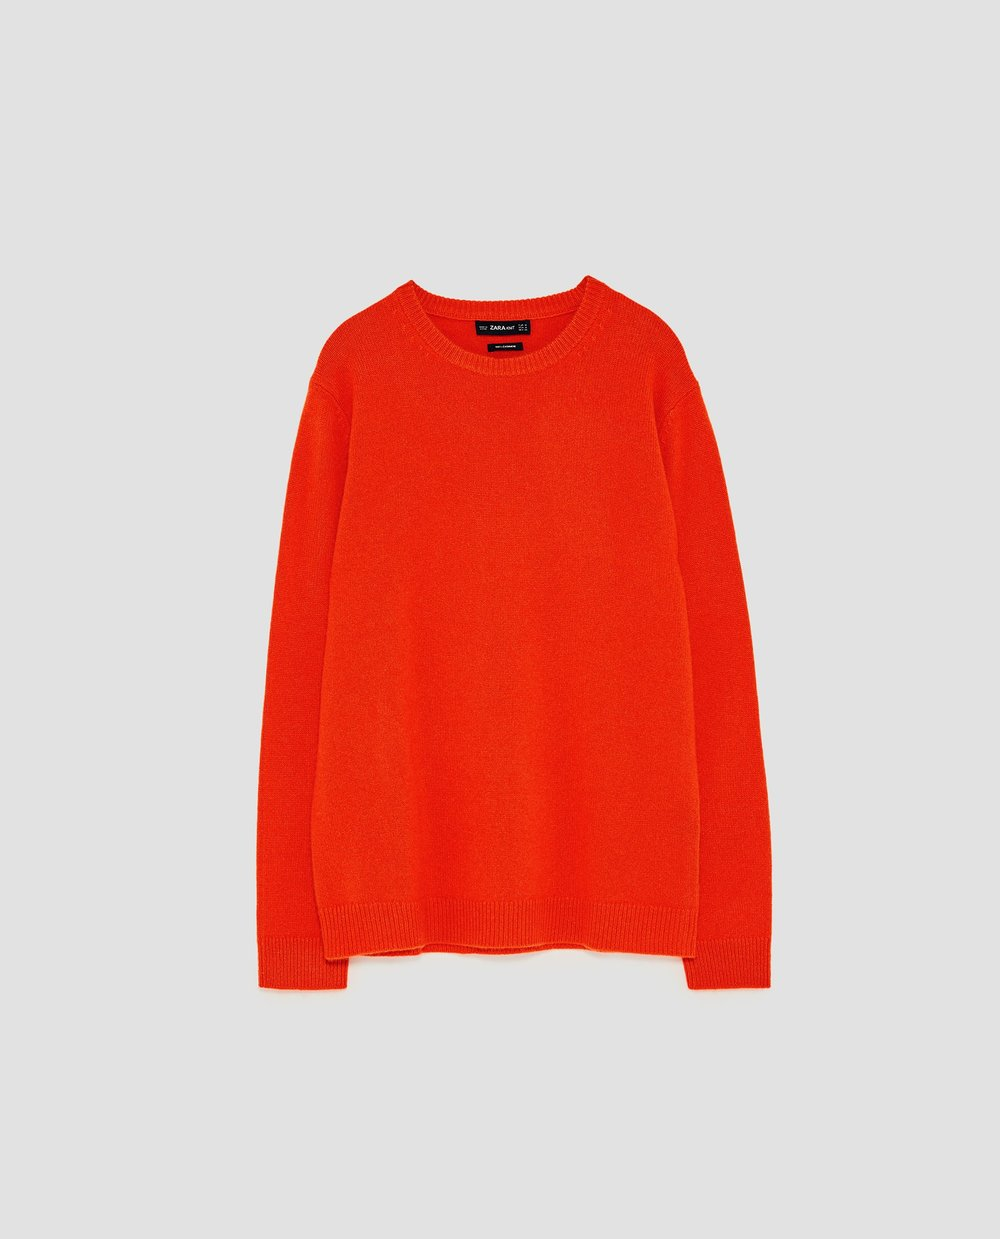 - CASHMERE SWEATER / Zara $149